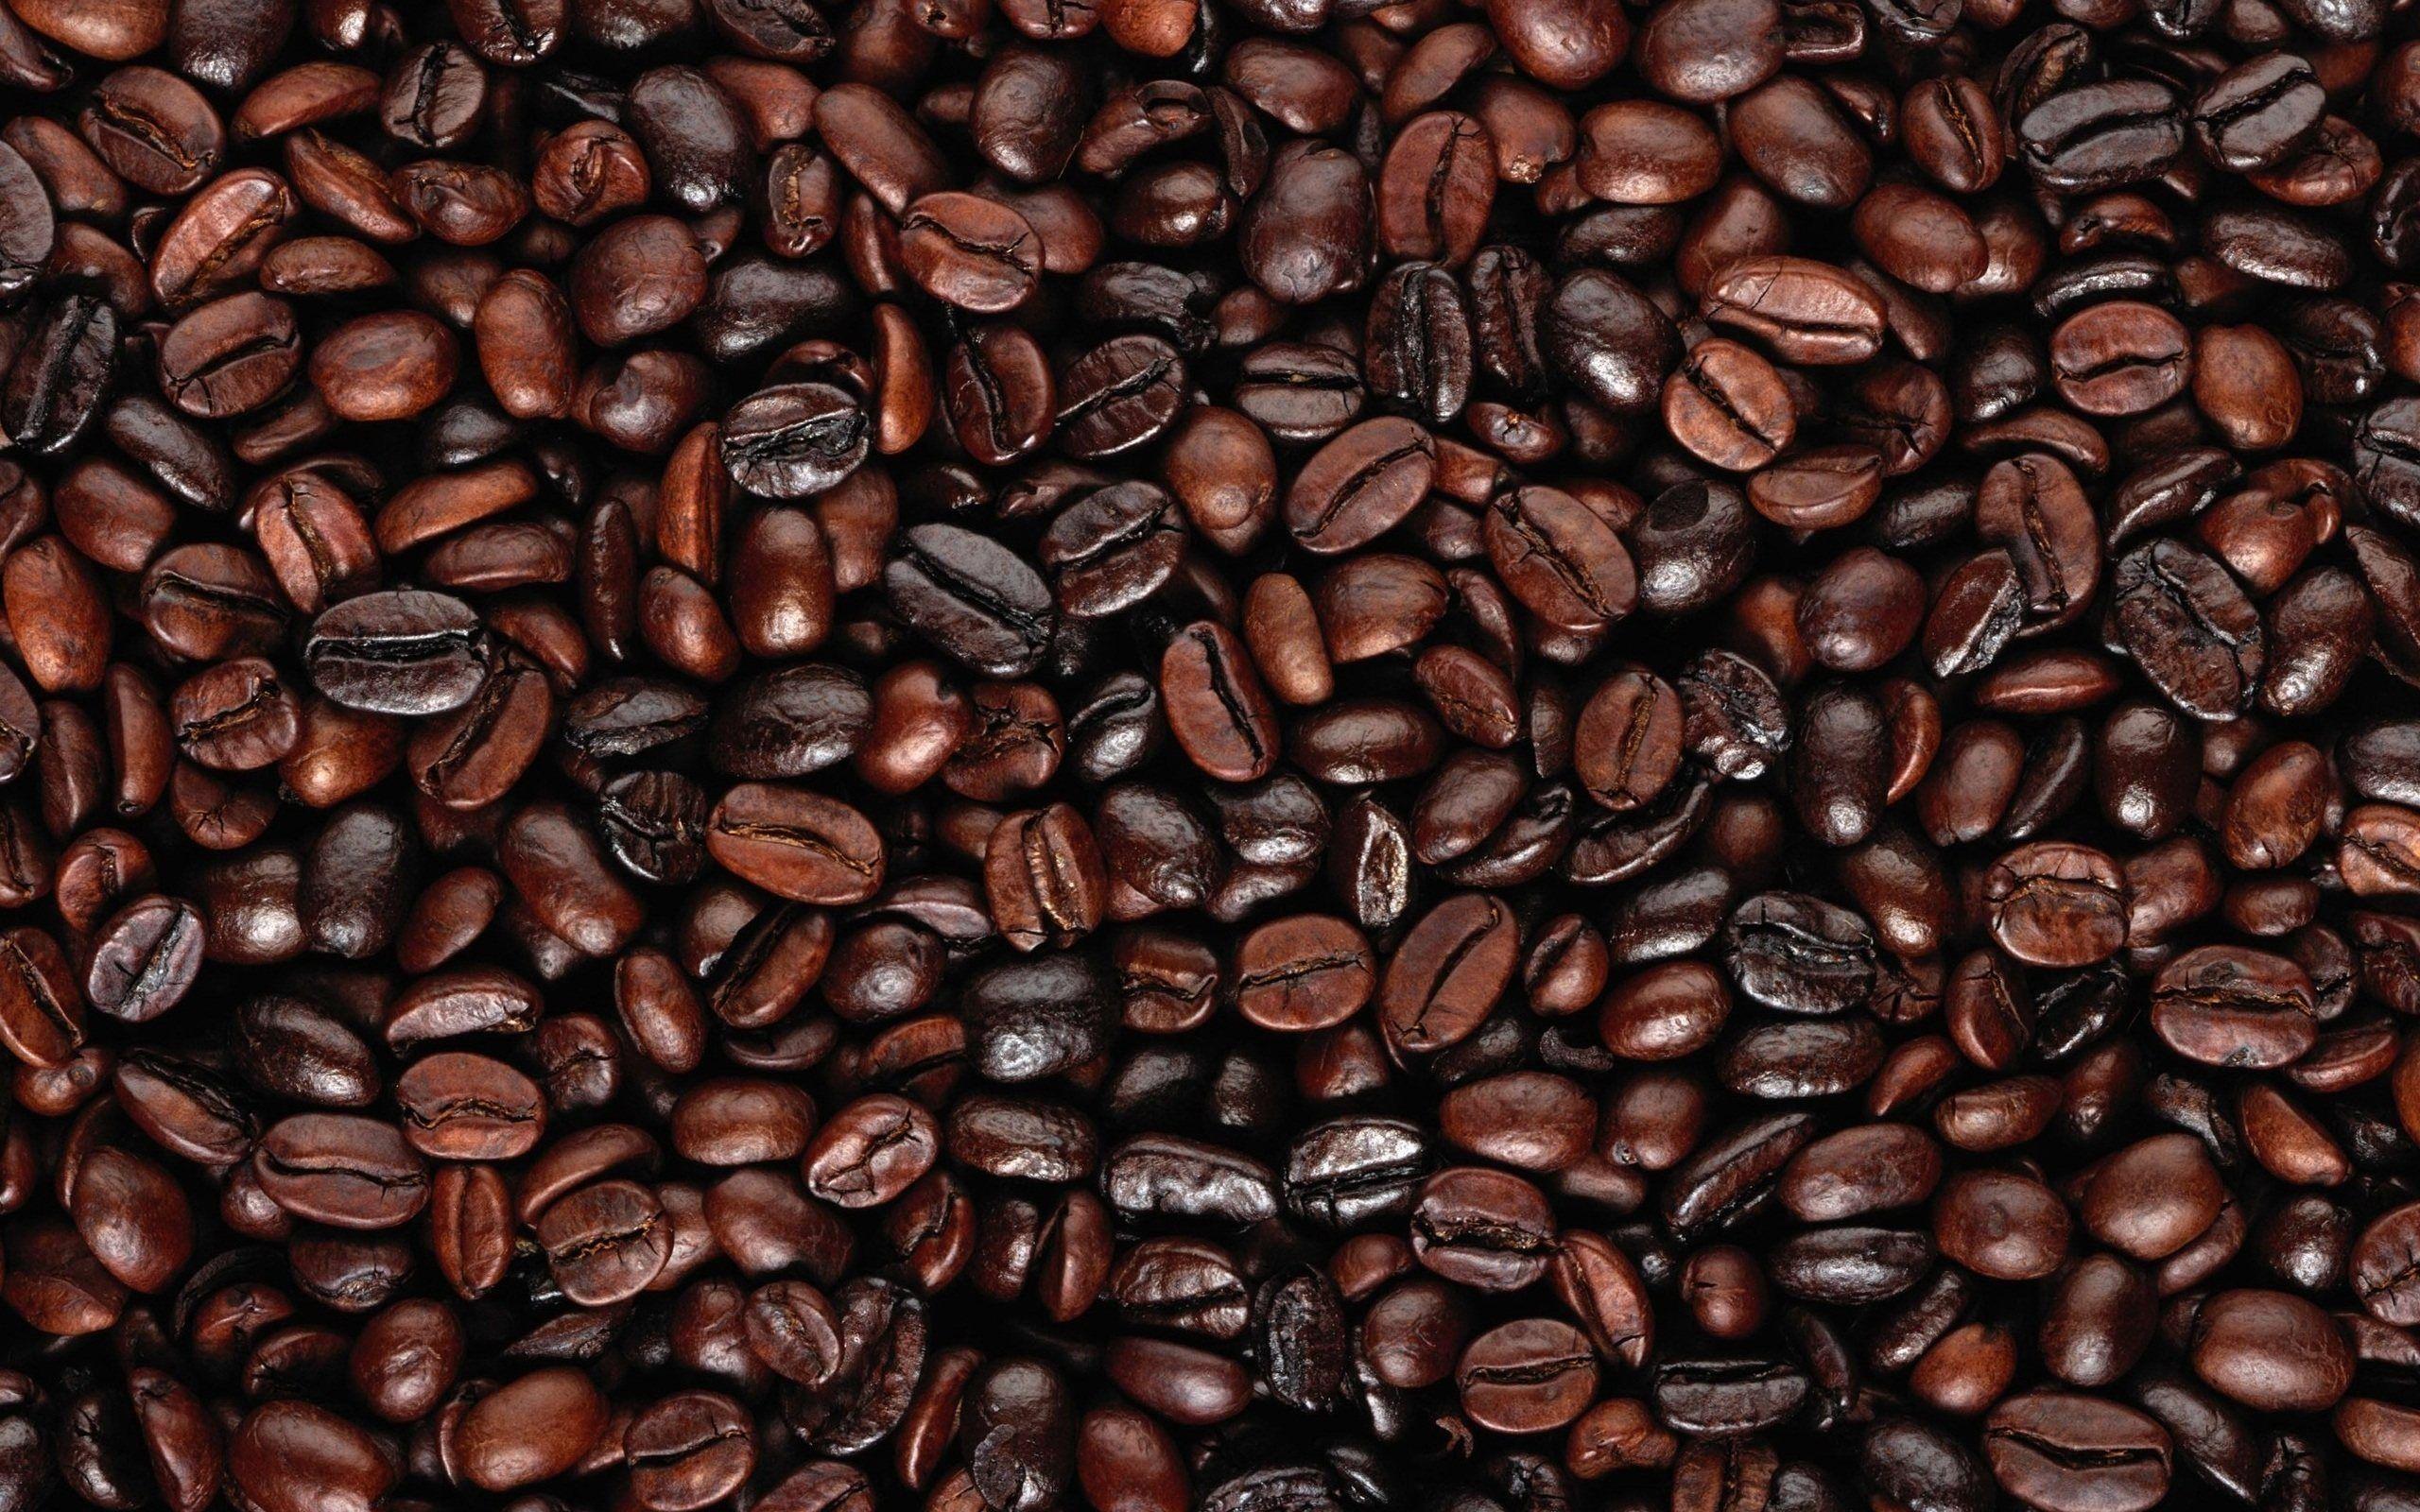 Coffee Beans Hd Wallpaper   Aurora-awards.com